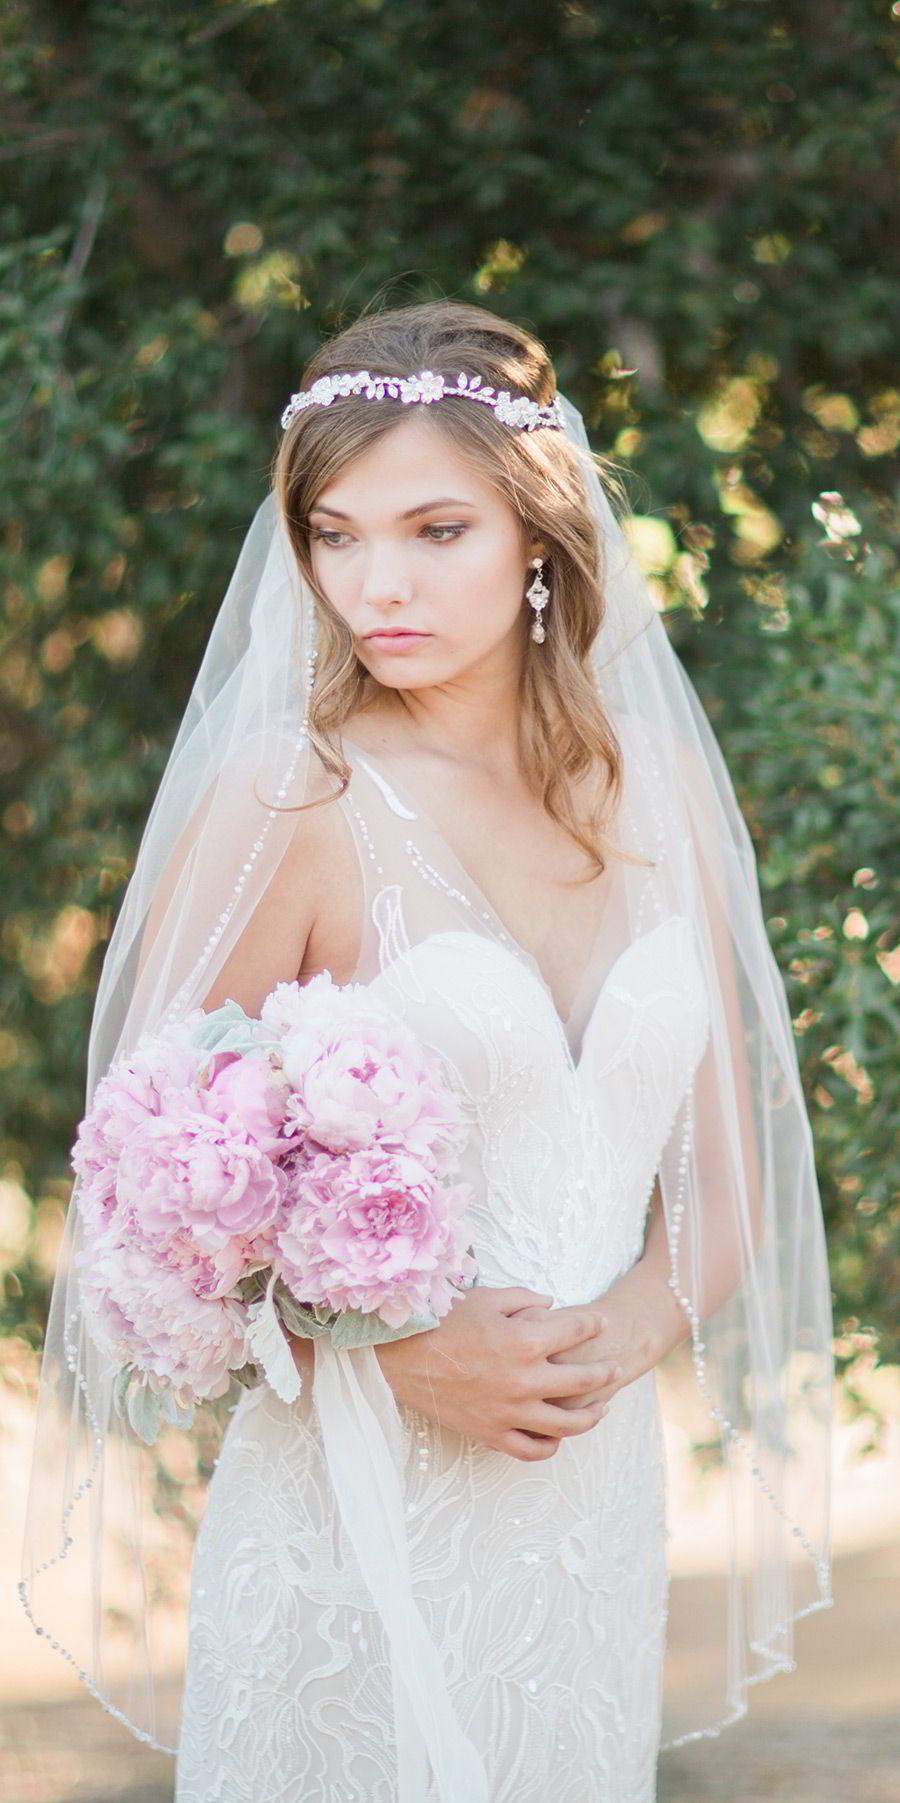 bel aire bridal accessories 6742 rhinestone headpiece halo veil